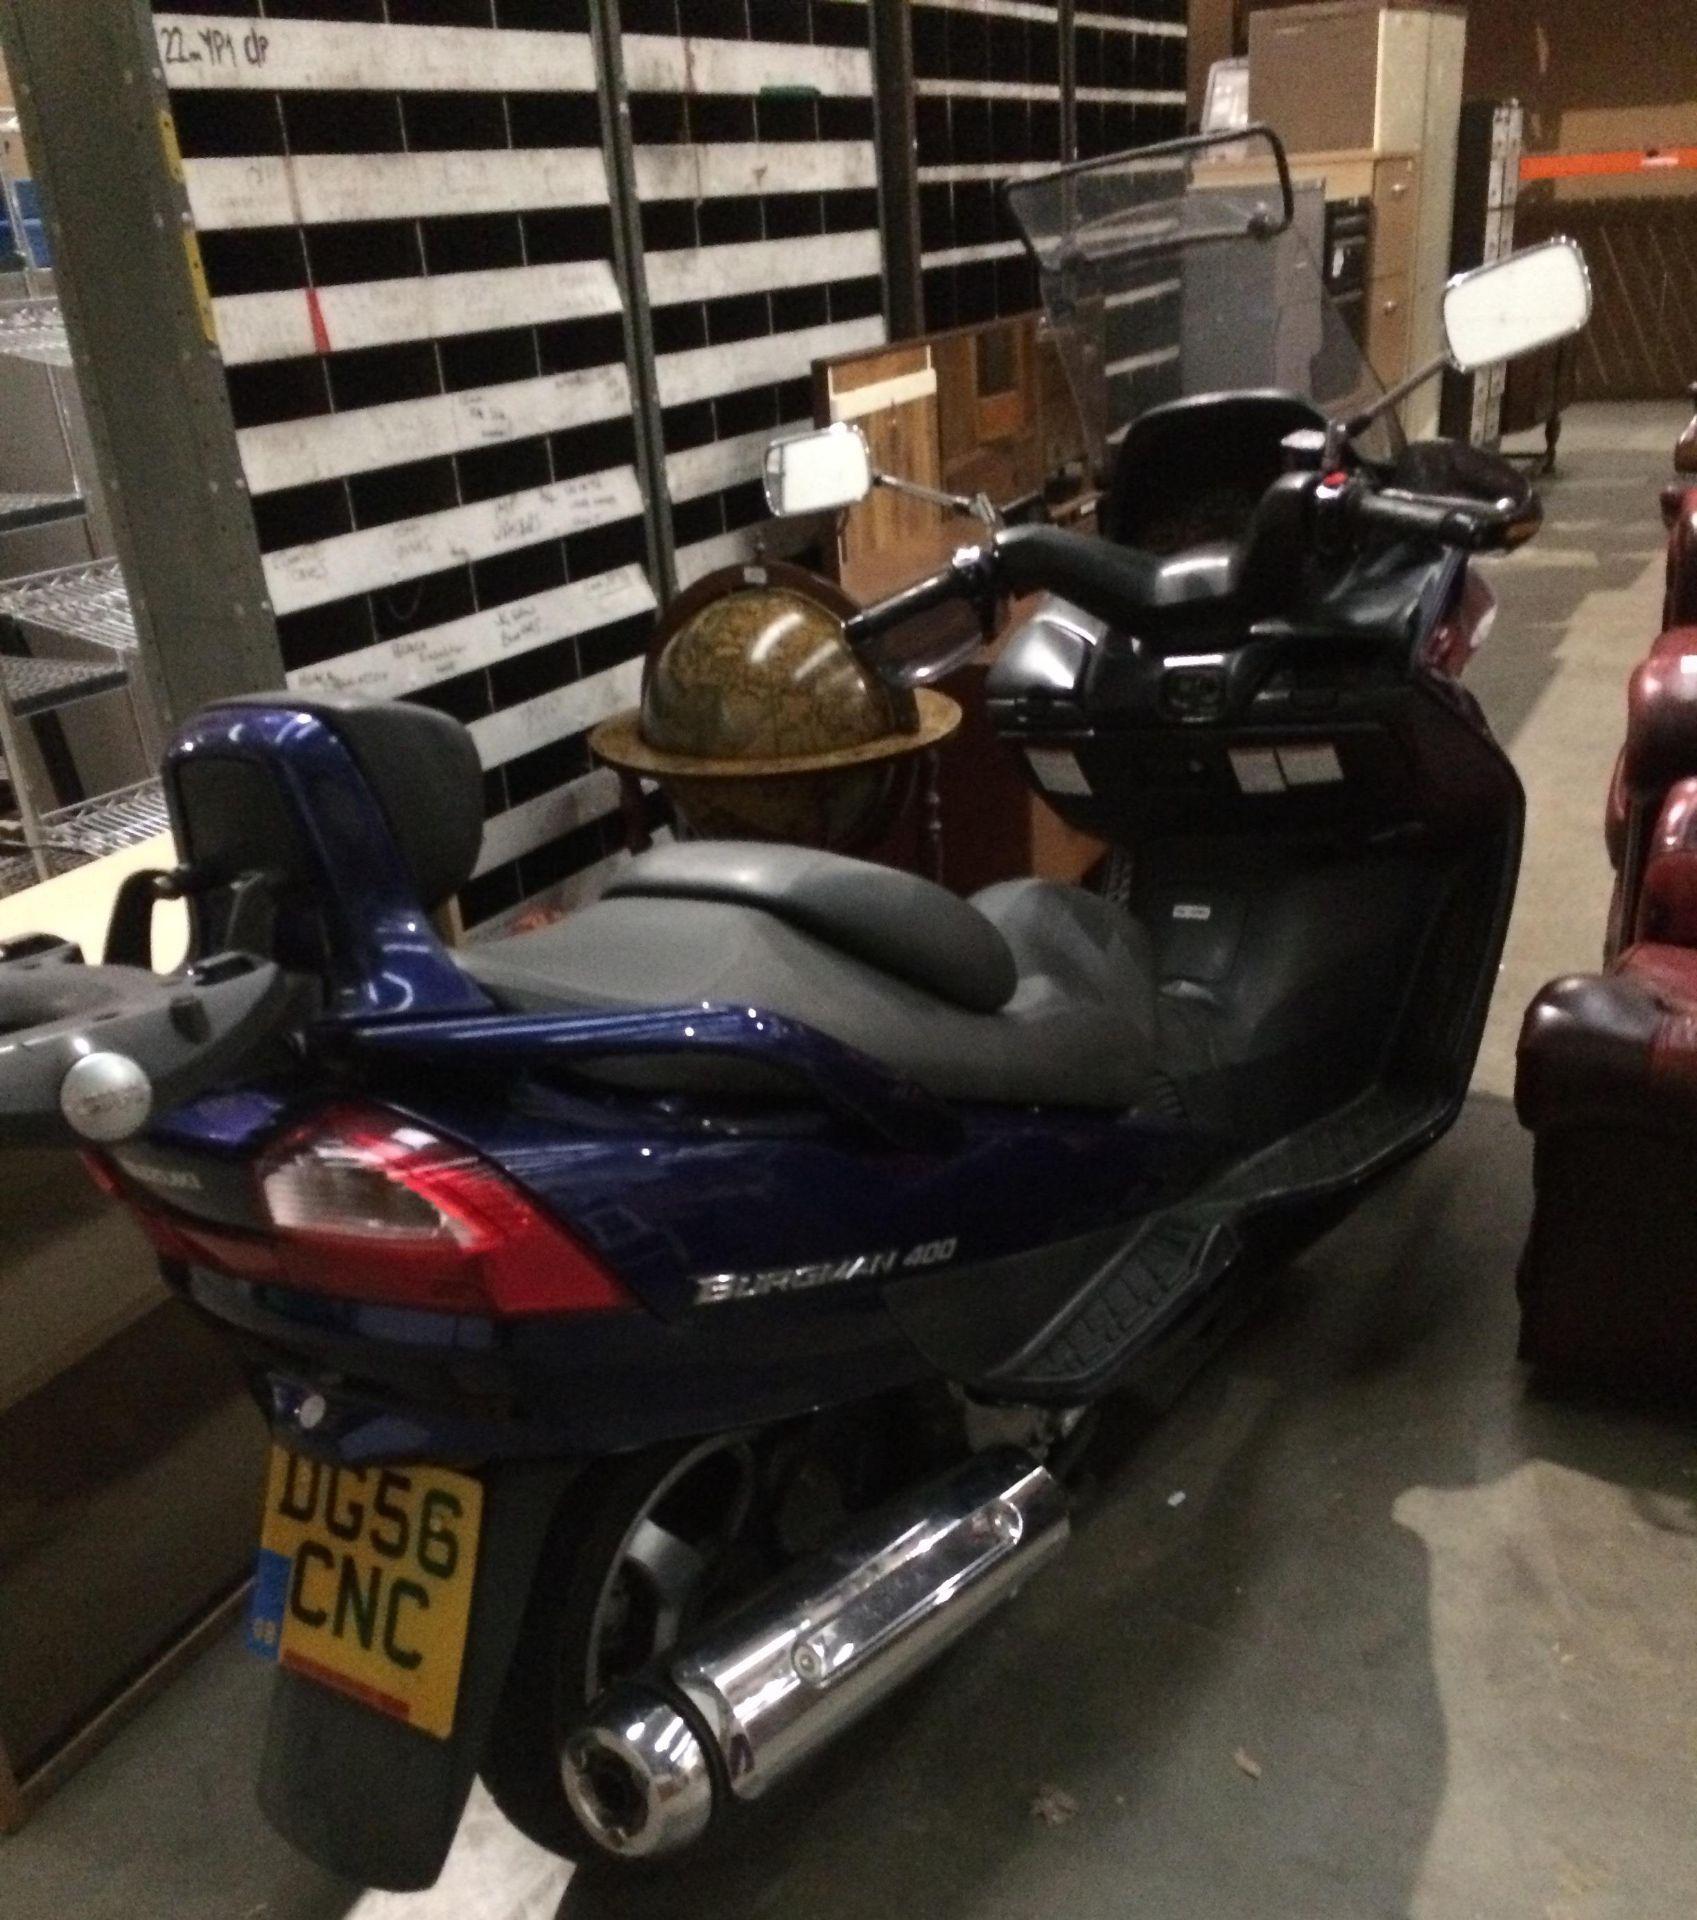 ON BEHALF OF THE INSOLVENCY SERVICE - SUZUKI BERGMAN 400 AN 400KG MOTORCYCLE - petrol - blue Reg - Image 4 of 10